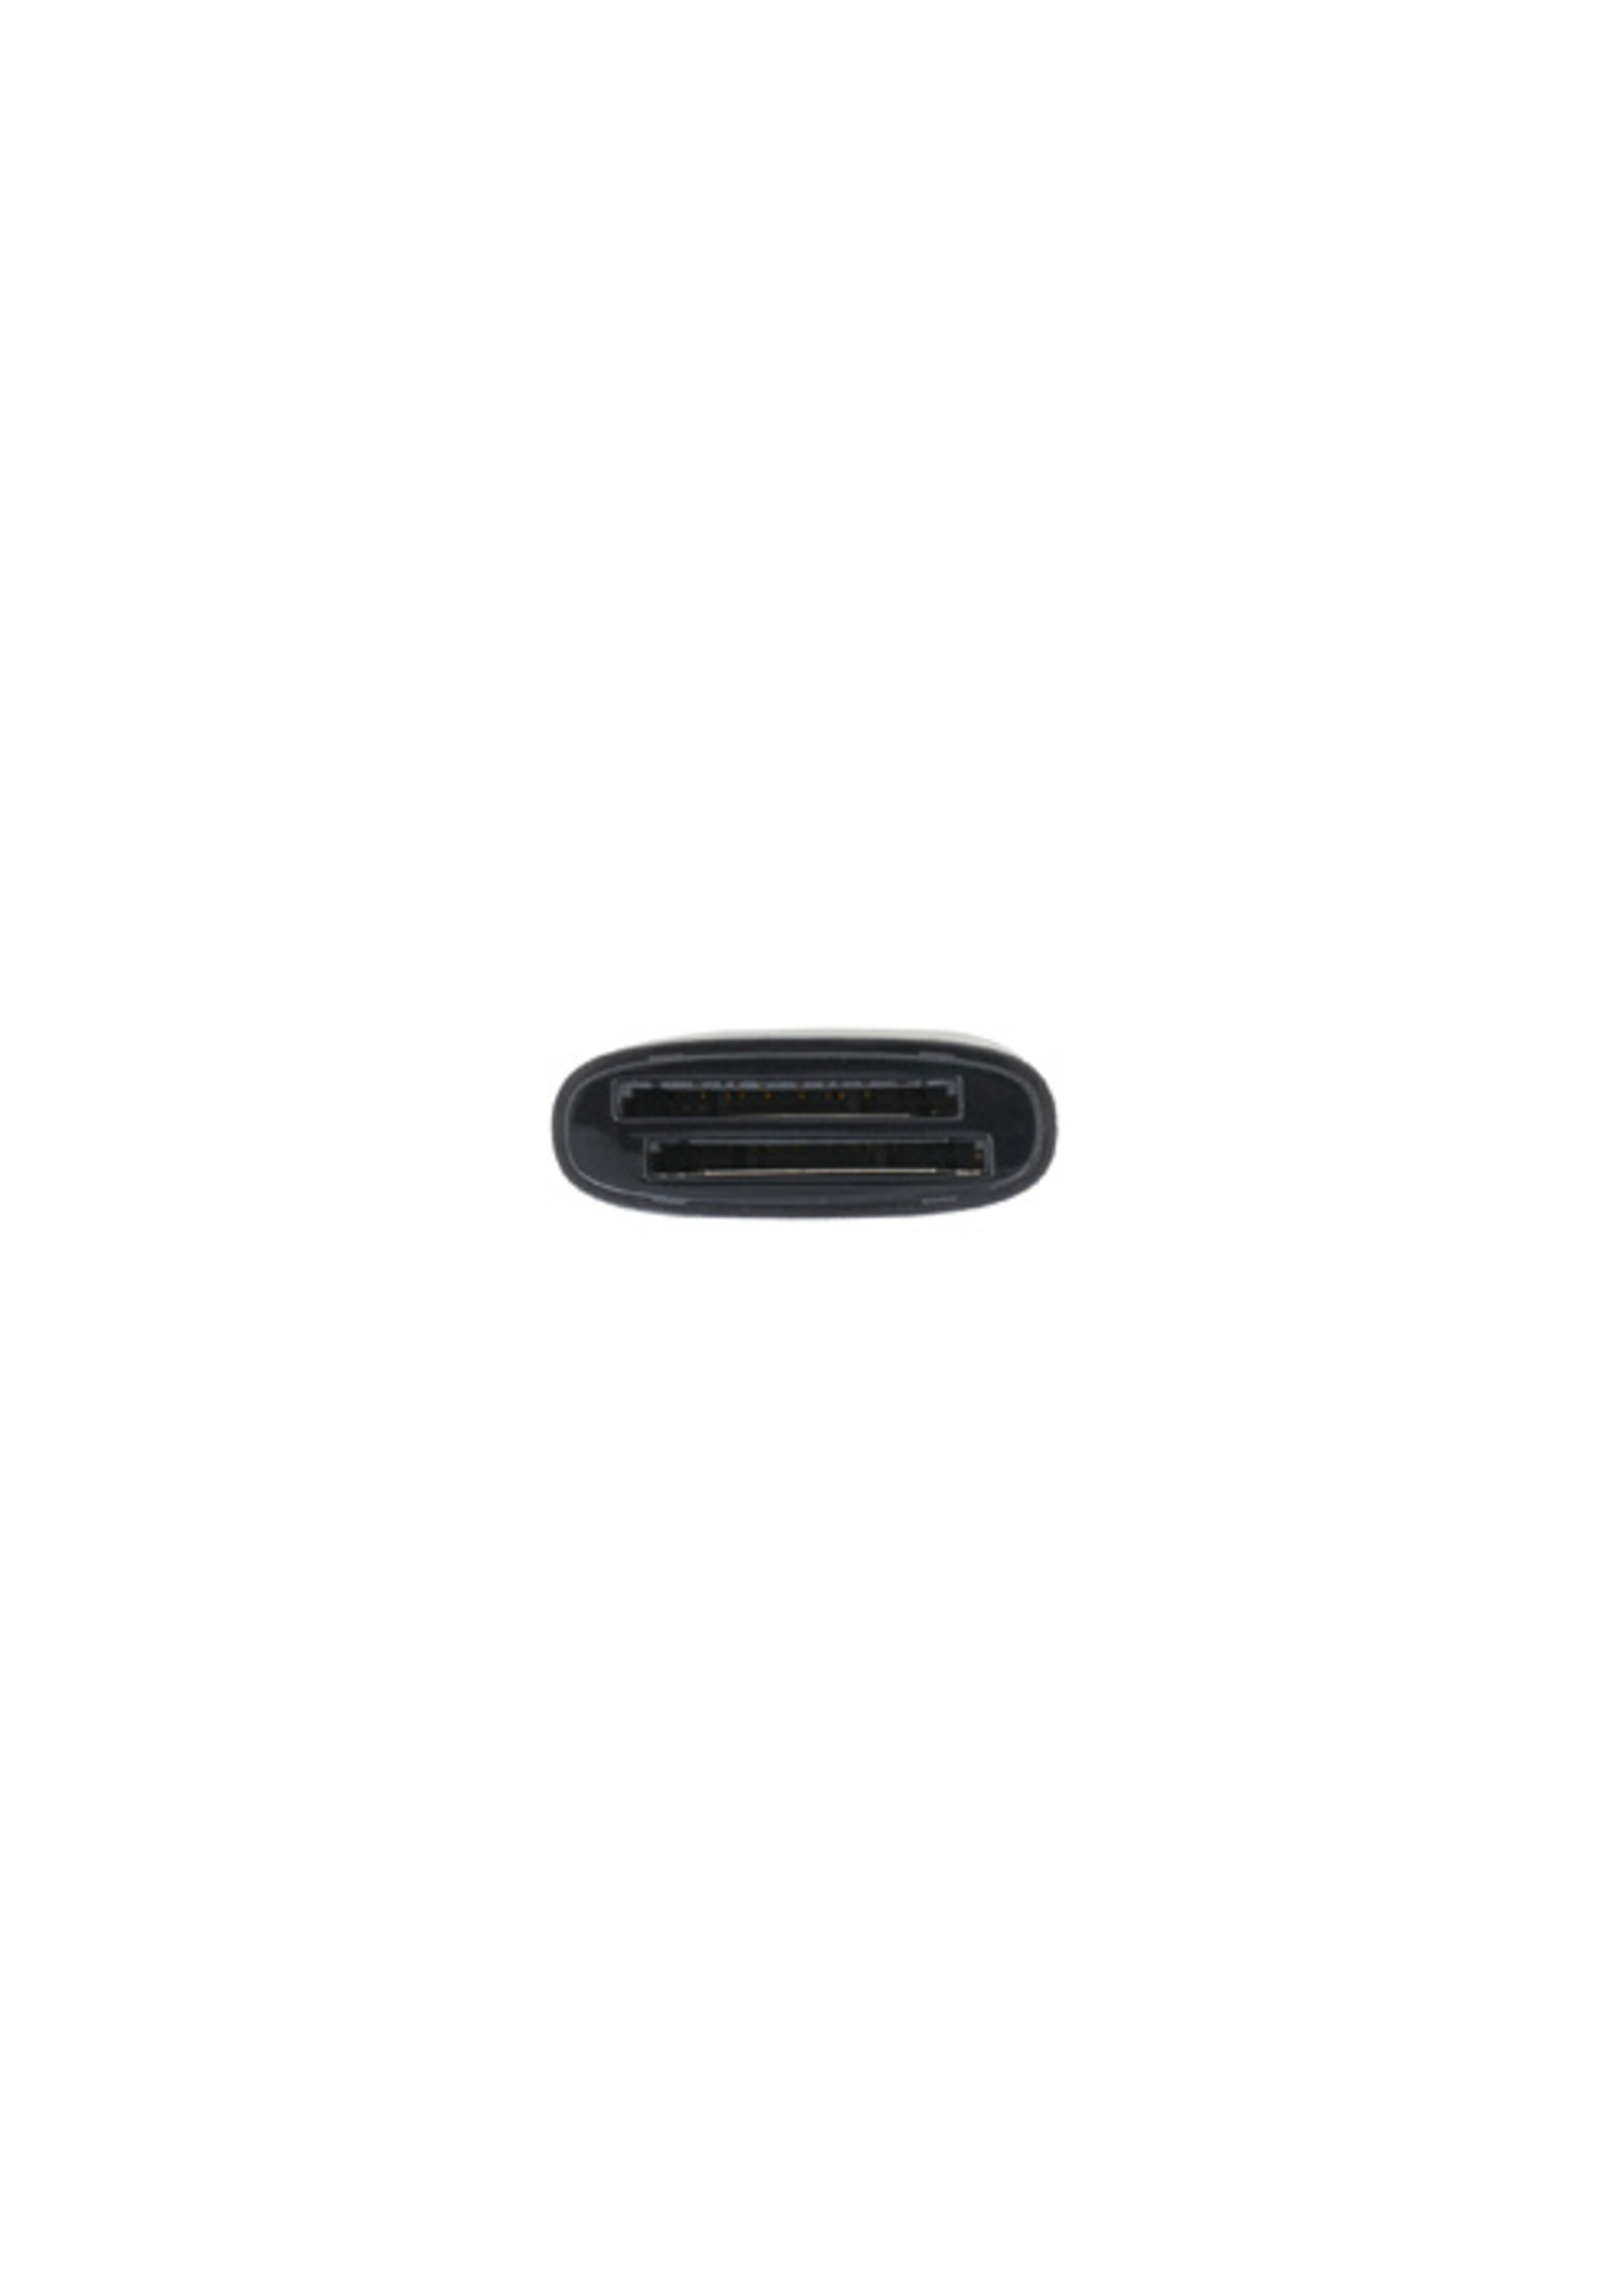 ProMaster USB 3.0 SD UHSII SD X 2 READER